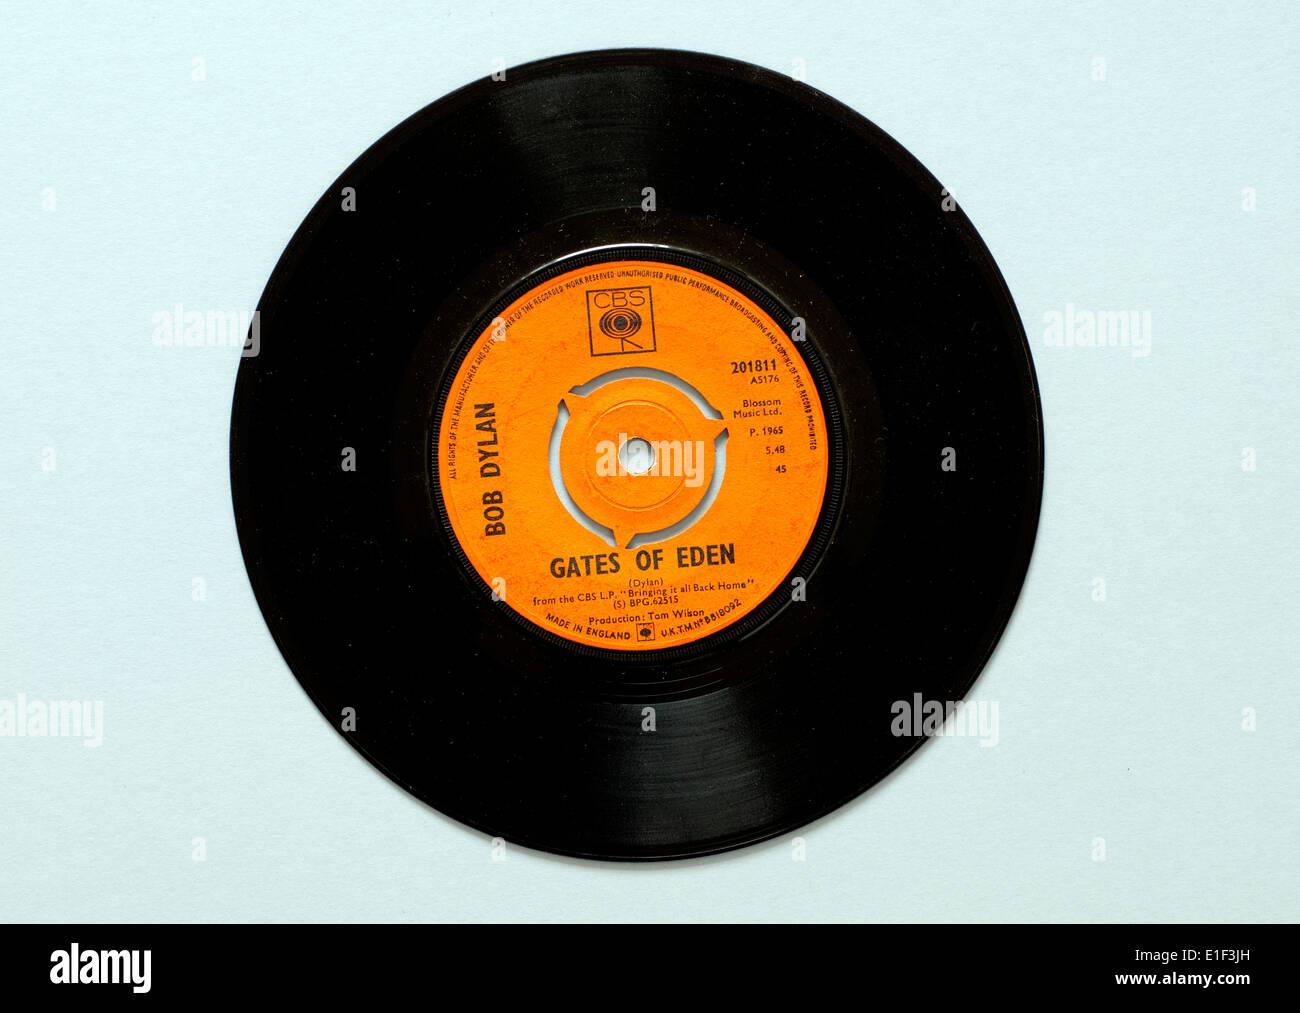 'Gates of Eden' by Bob Dylan, vinyl 45 rpm record. - Stock Image